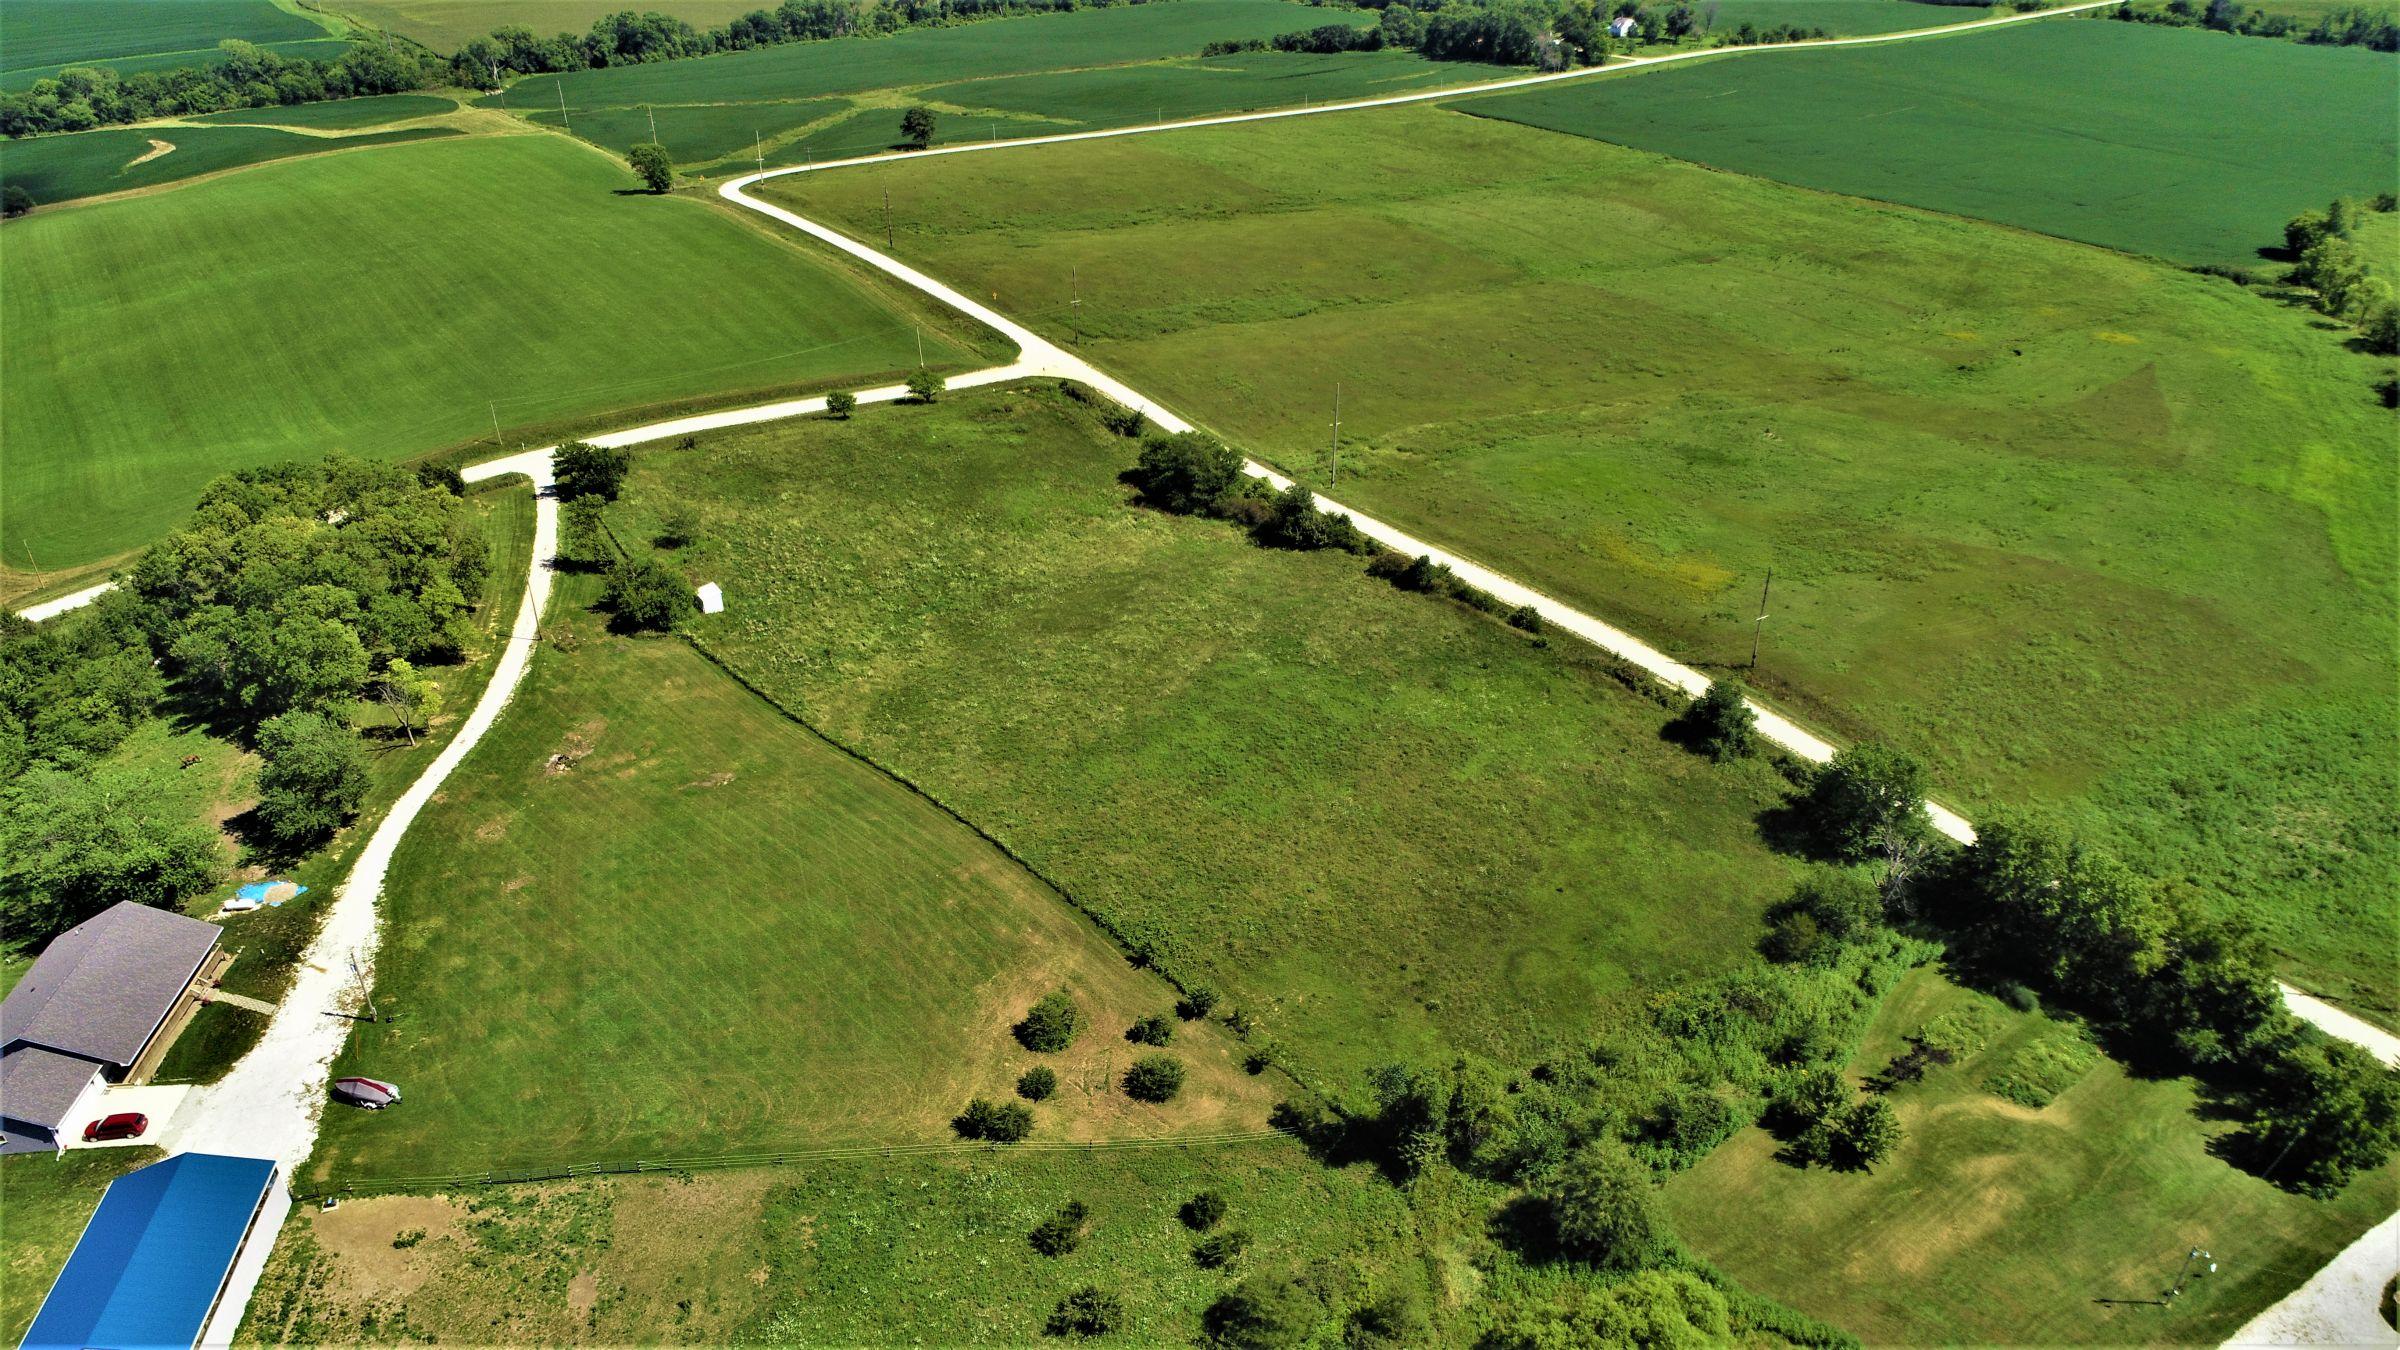 land-warren-county-iowa-6-acres-listing-number-15709-6-2021-08-27-202009.JPG